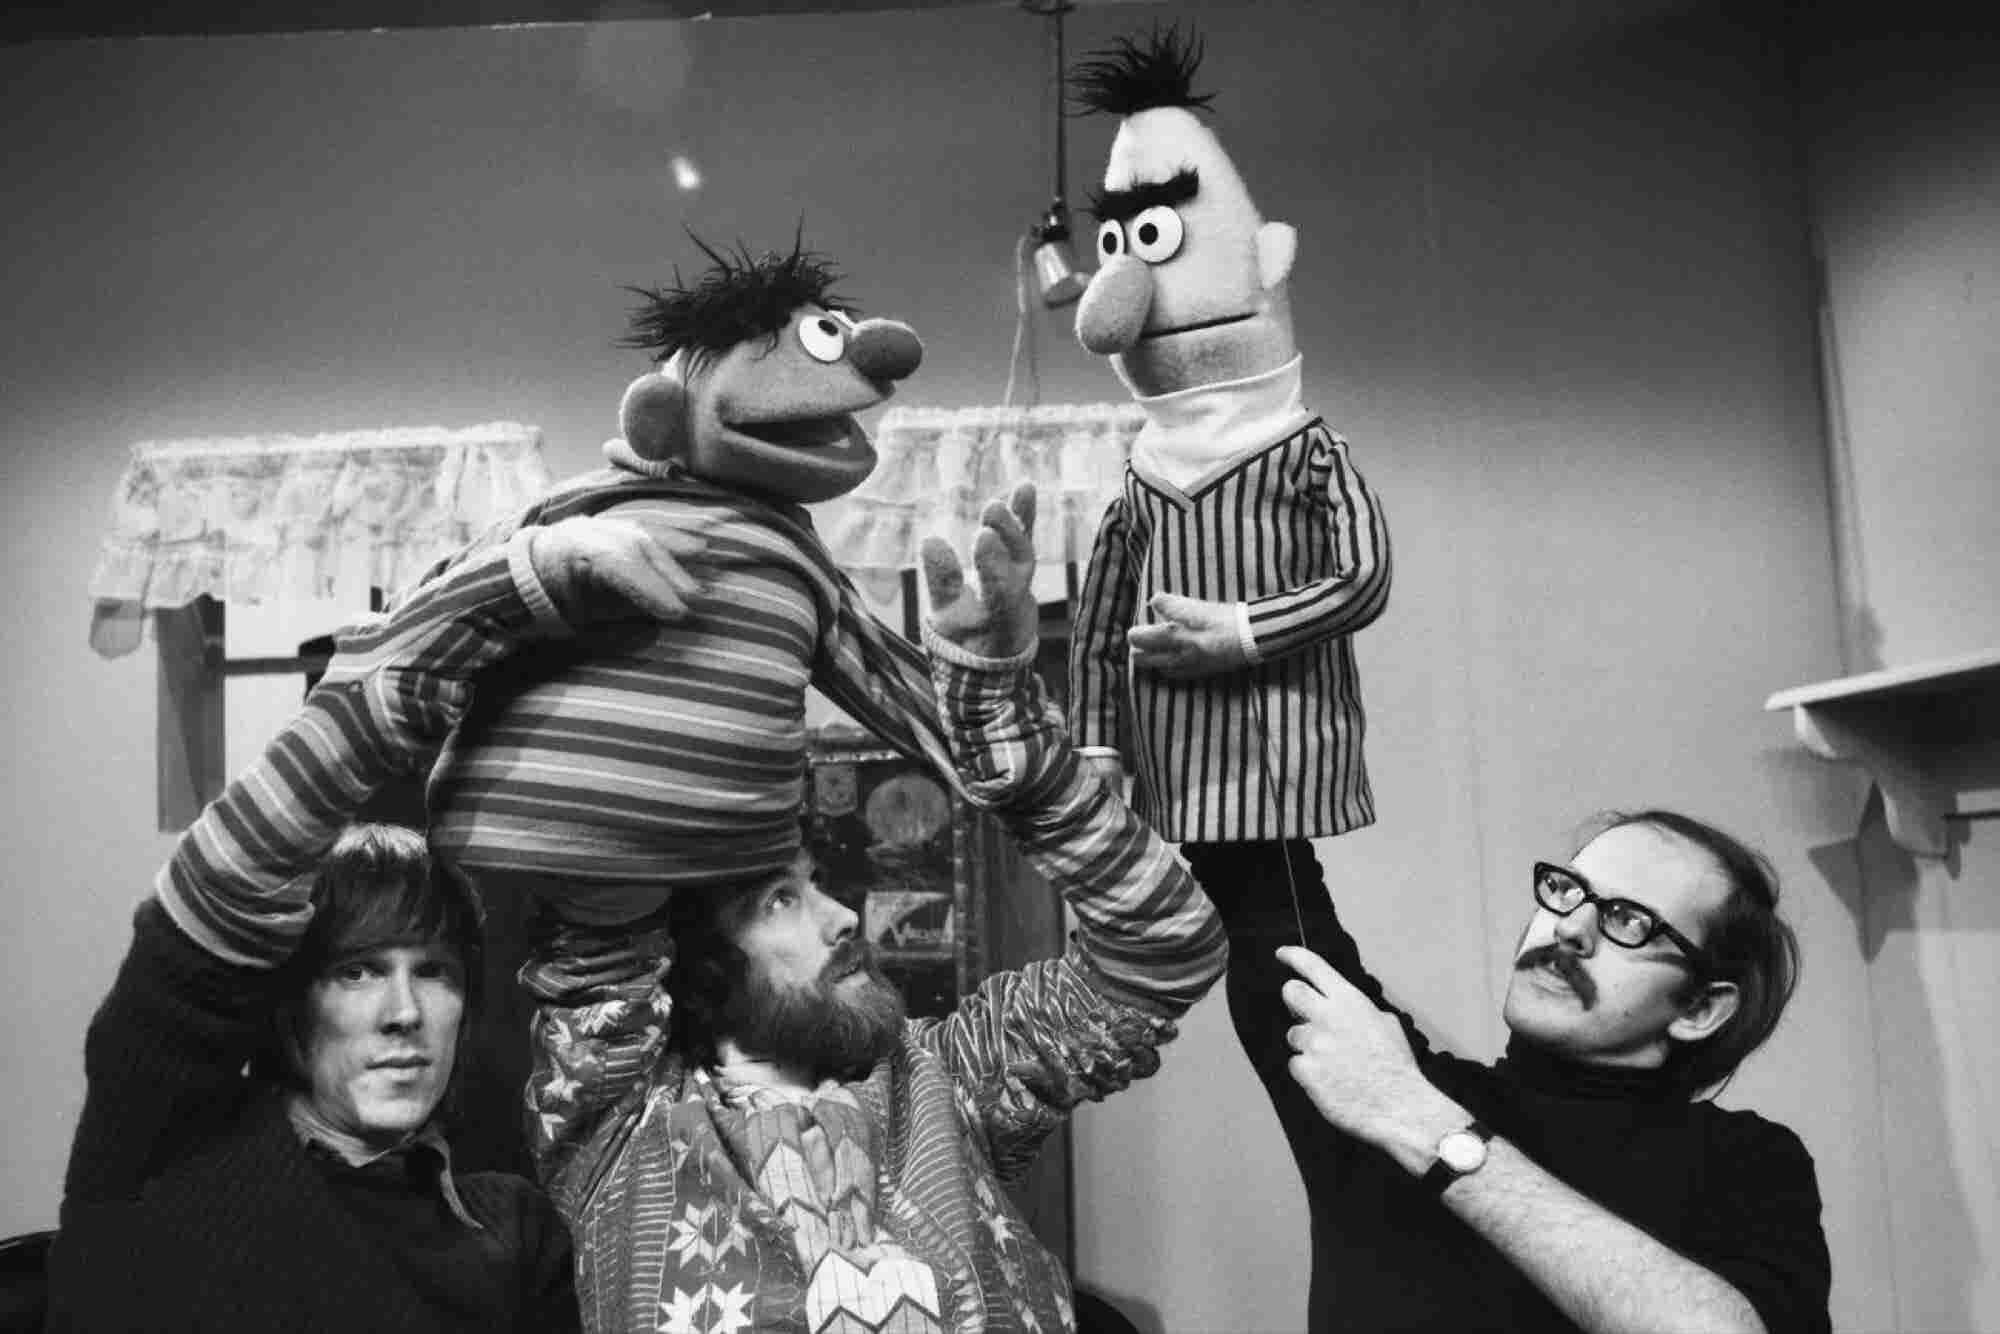 Frank Oz Reveals Jim Henson's Creative and Inspiring Leadership Secrets